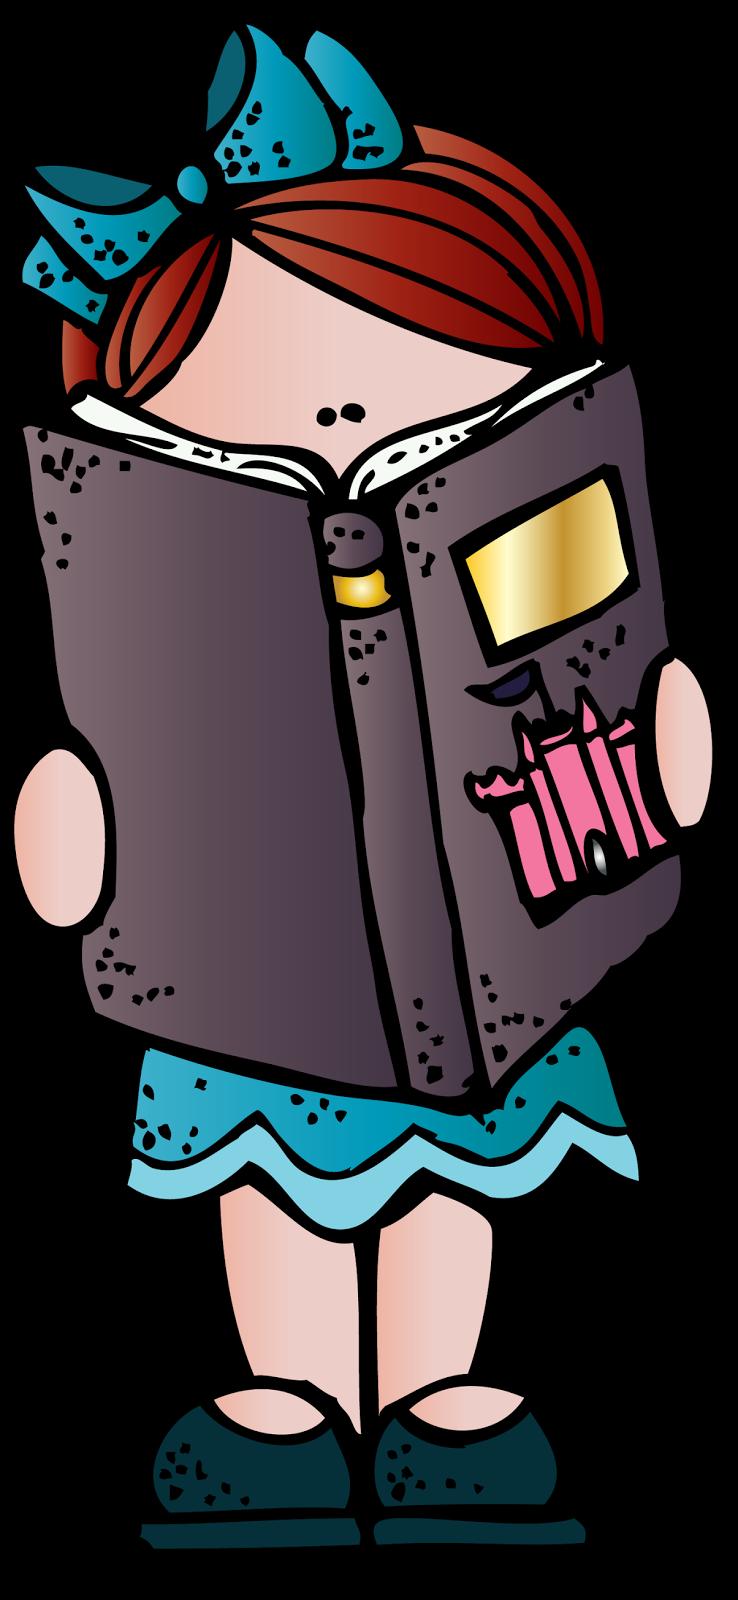 Pencil cliparts free download. Clipart reading melonheadz